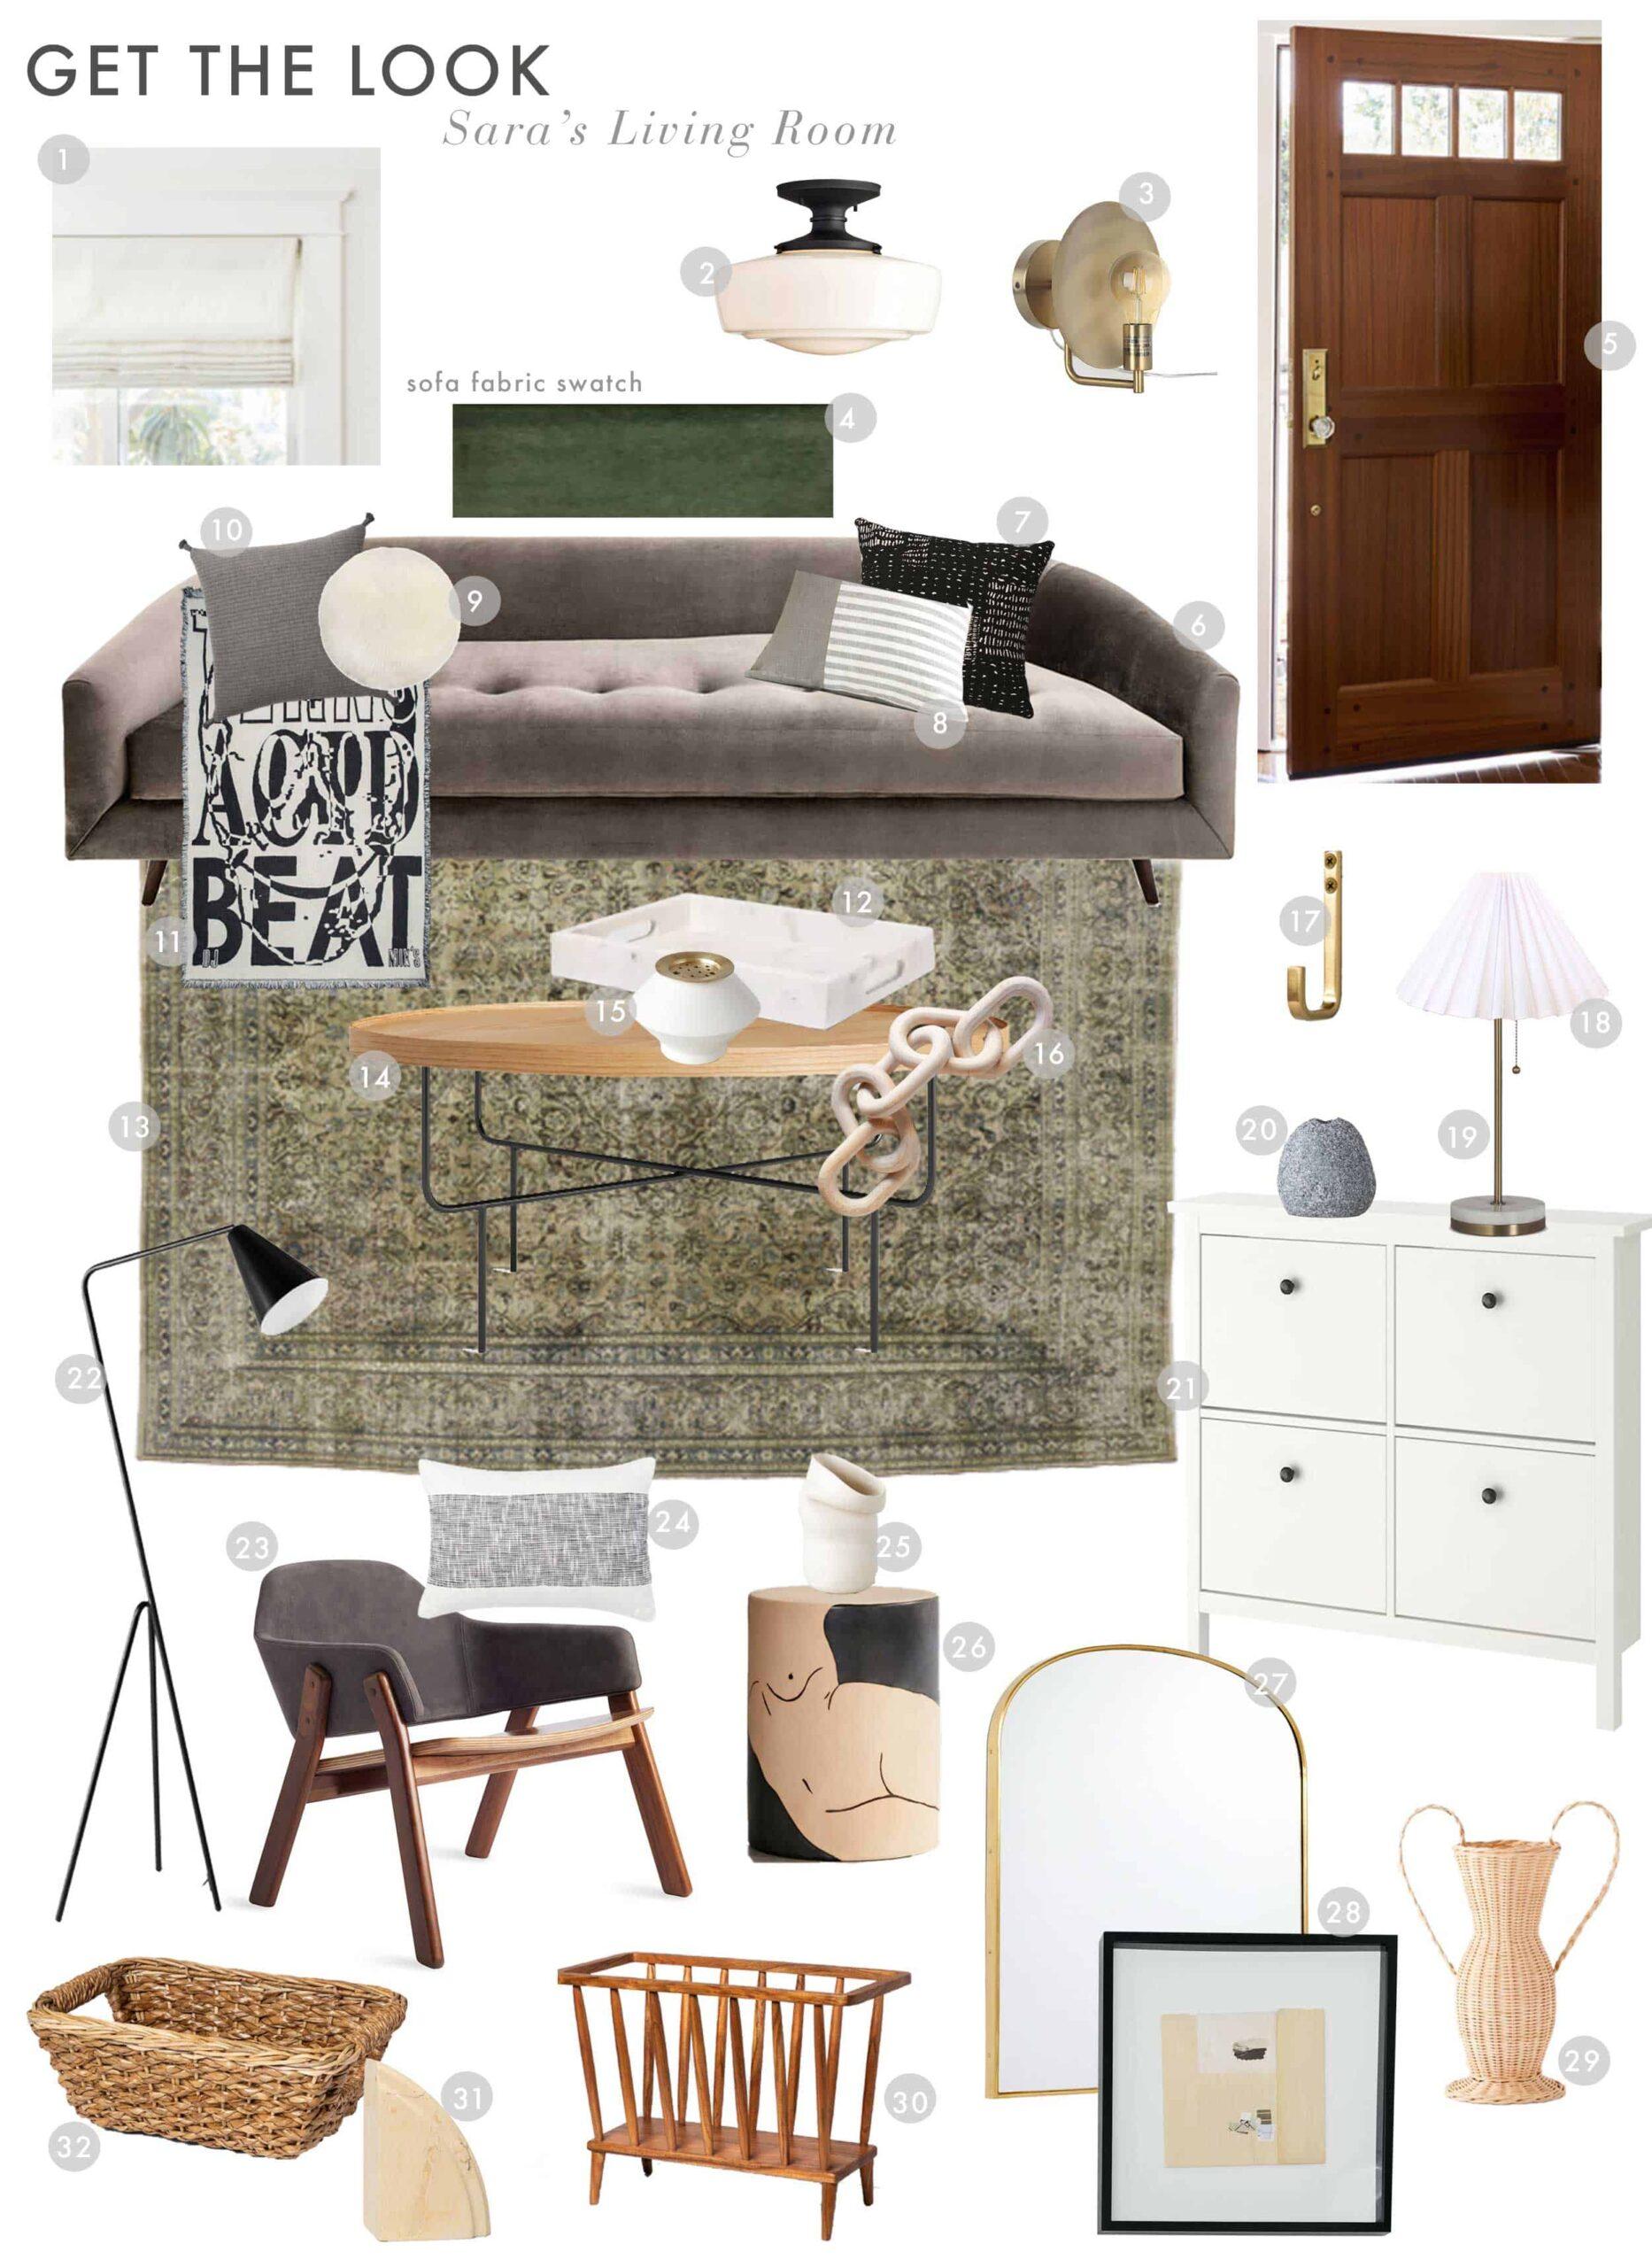 Sara's Living Room